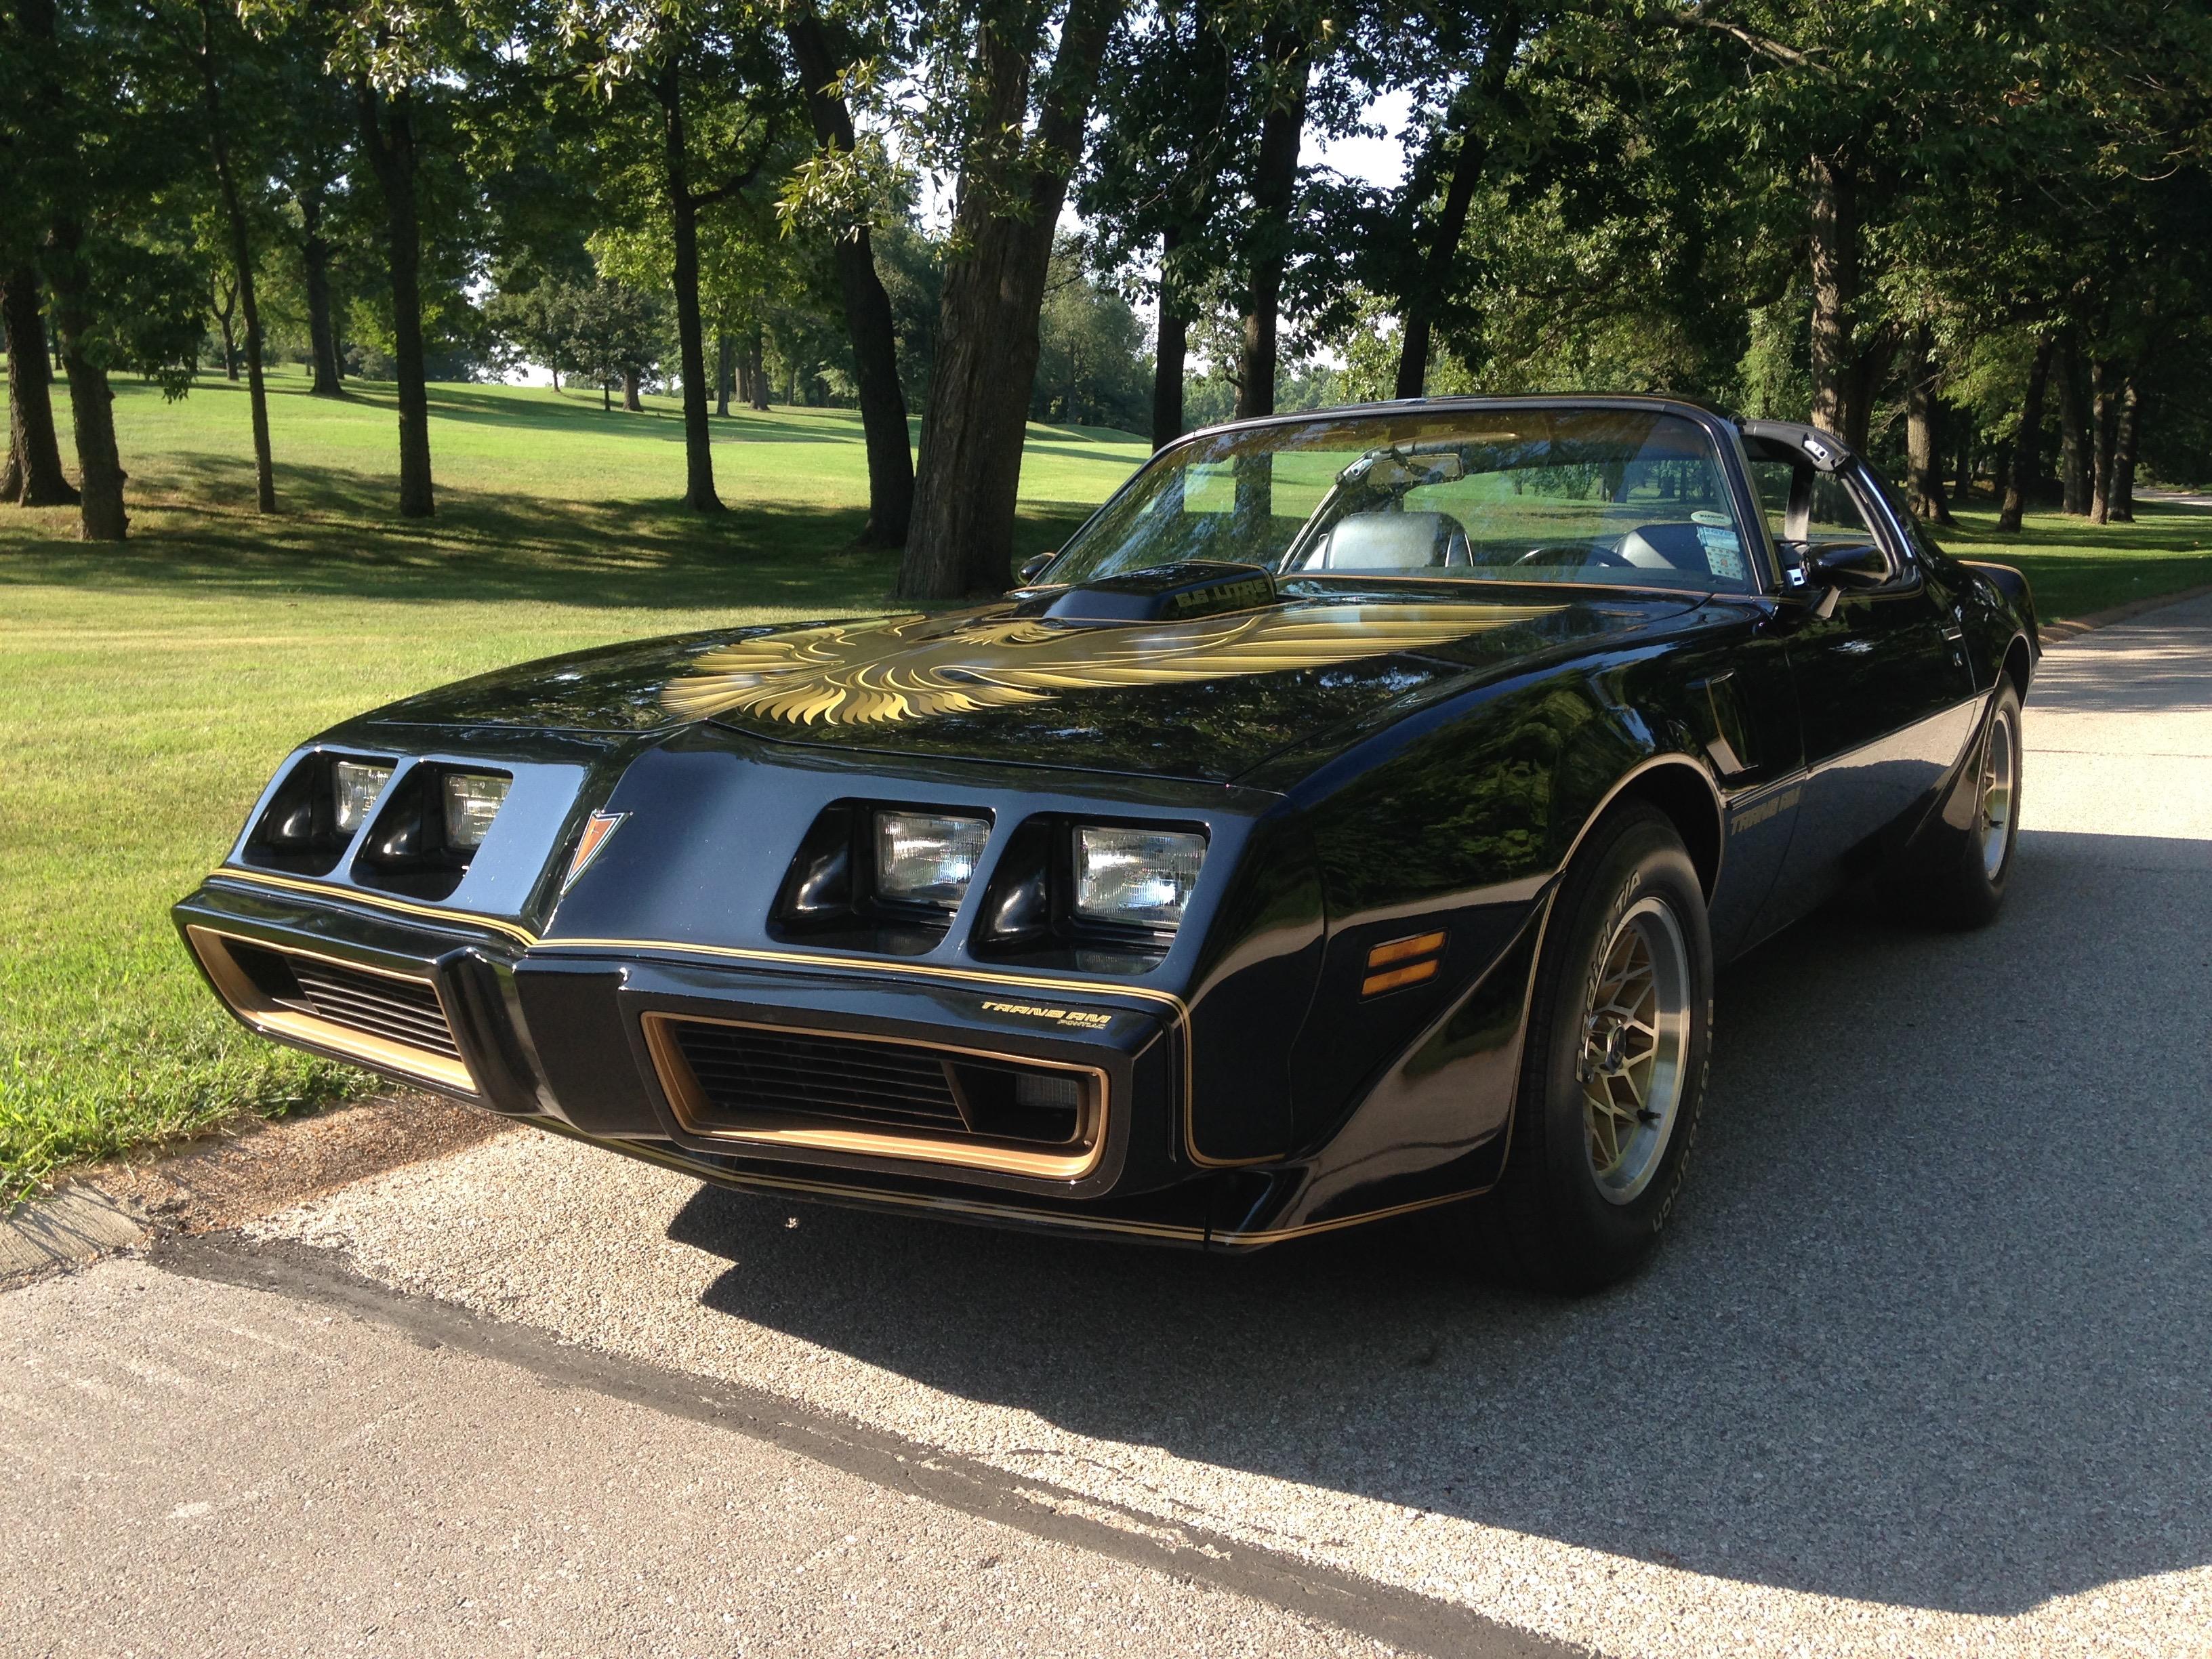 1979 Pontiac Trans Am (Special Edition Y-84)